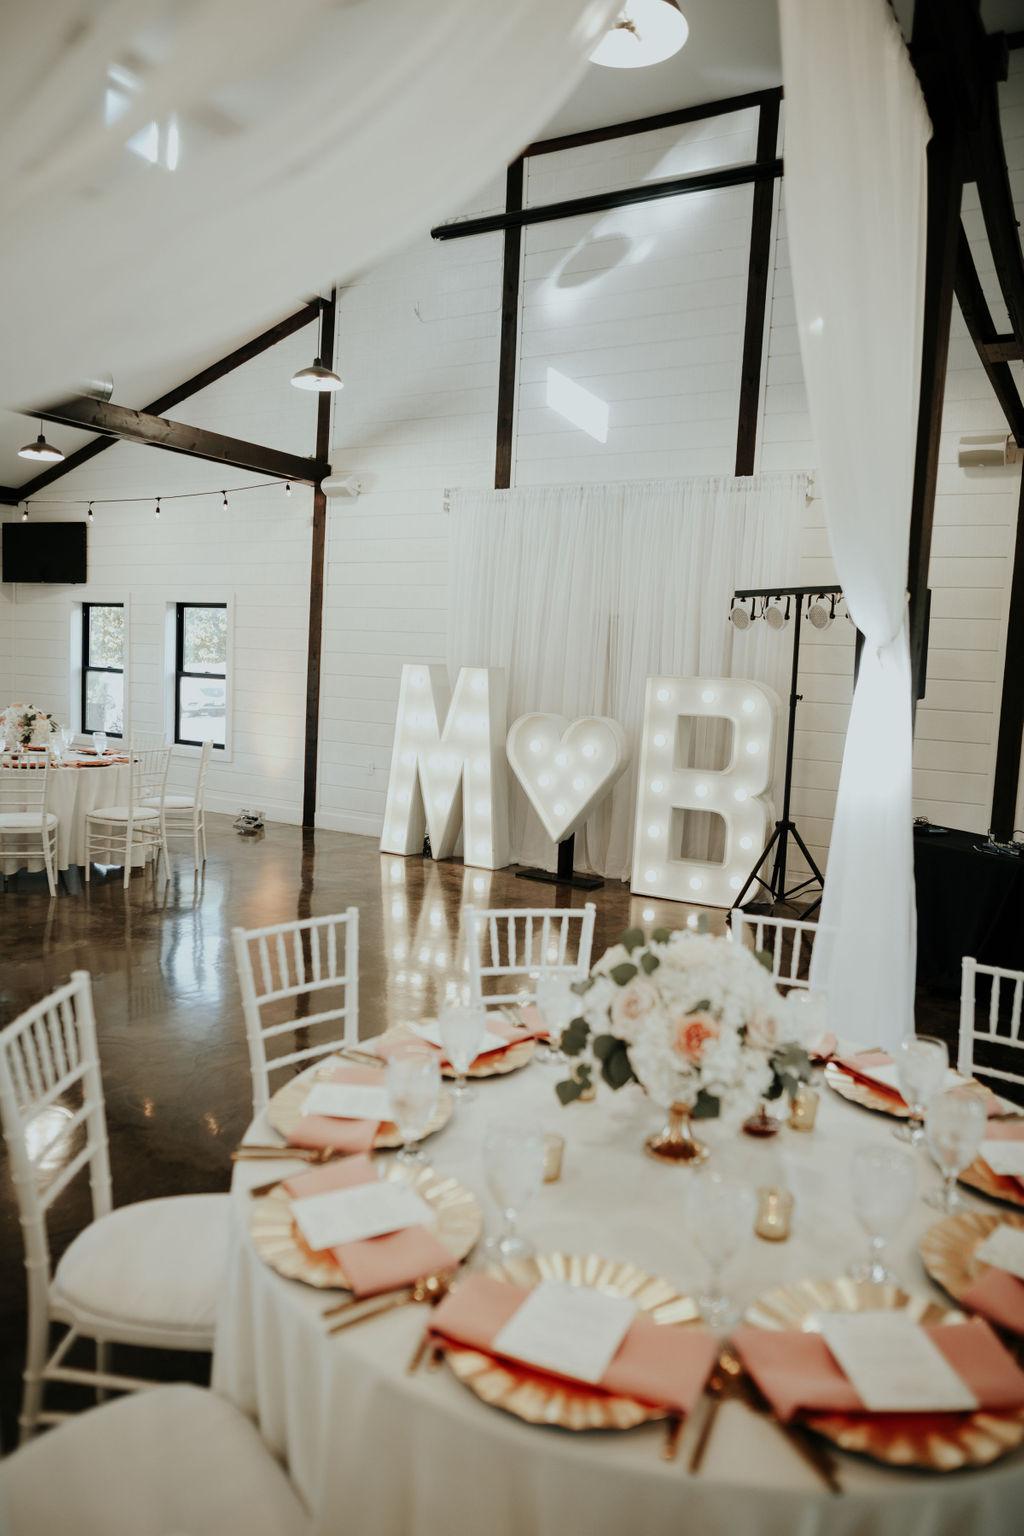 Best Oklahoma Outdoor Wedding Venue Tulsa Bixby White Barn 41.jpg